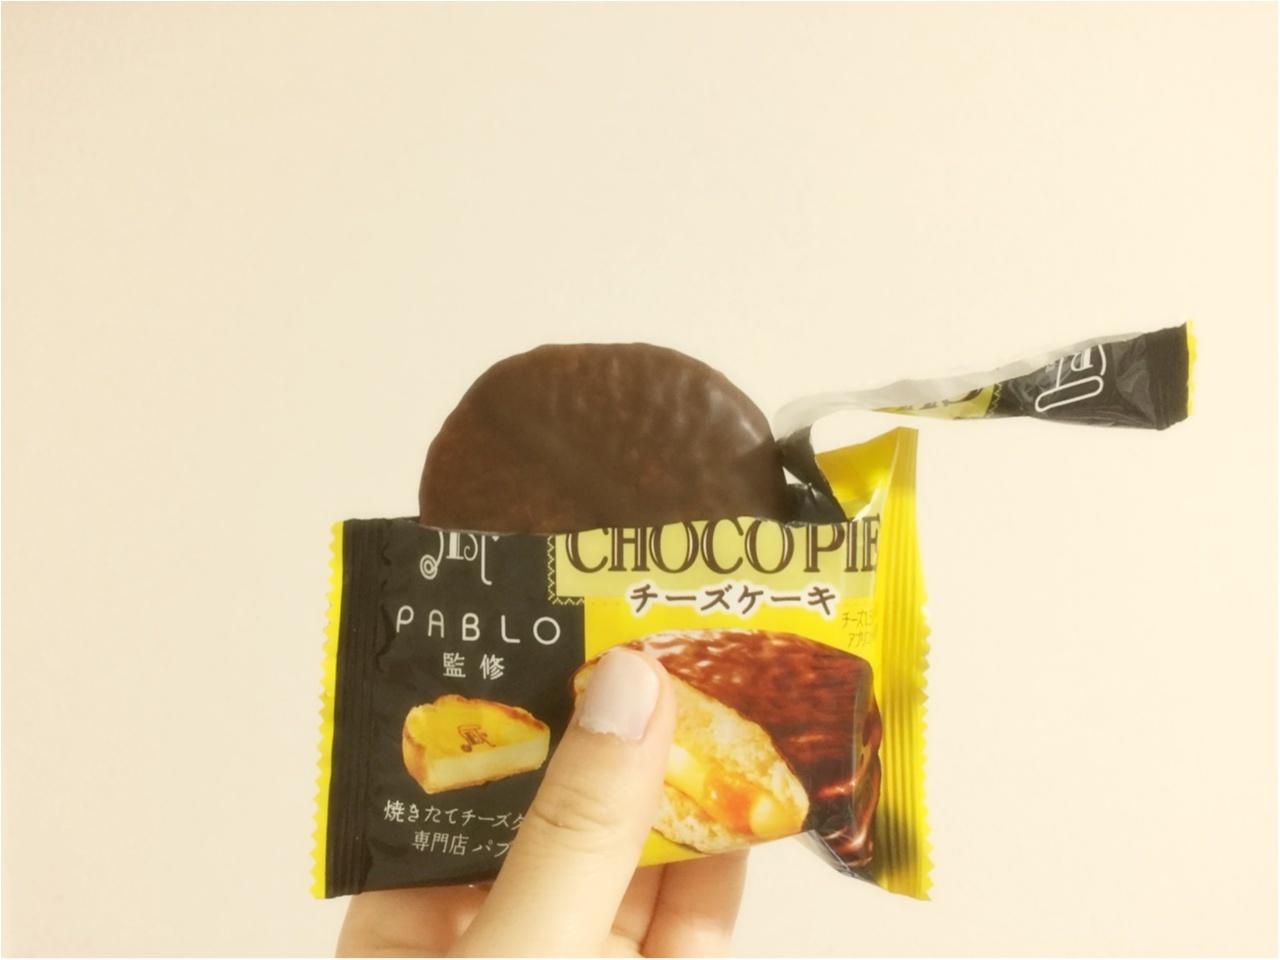 PABLO監修CHOCOPIEチーズケーキ♡*_2